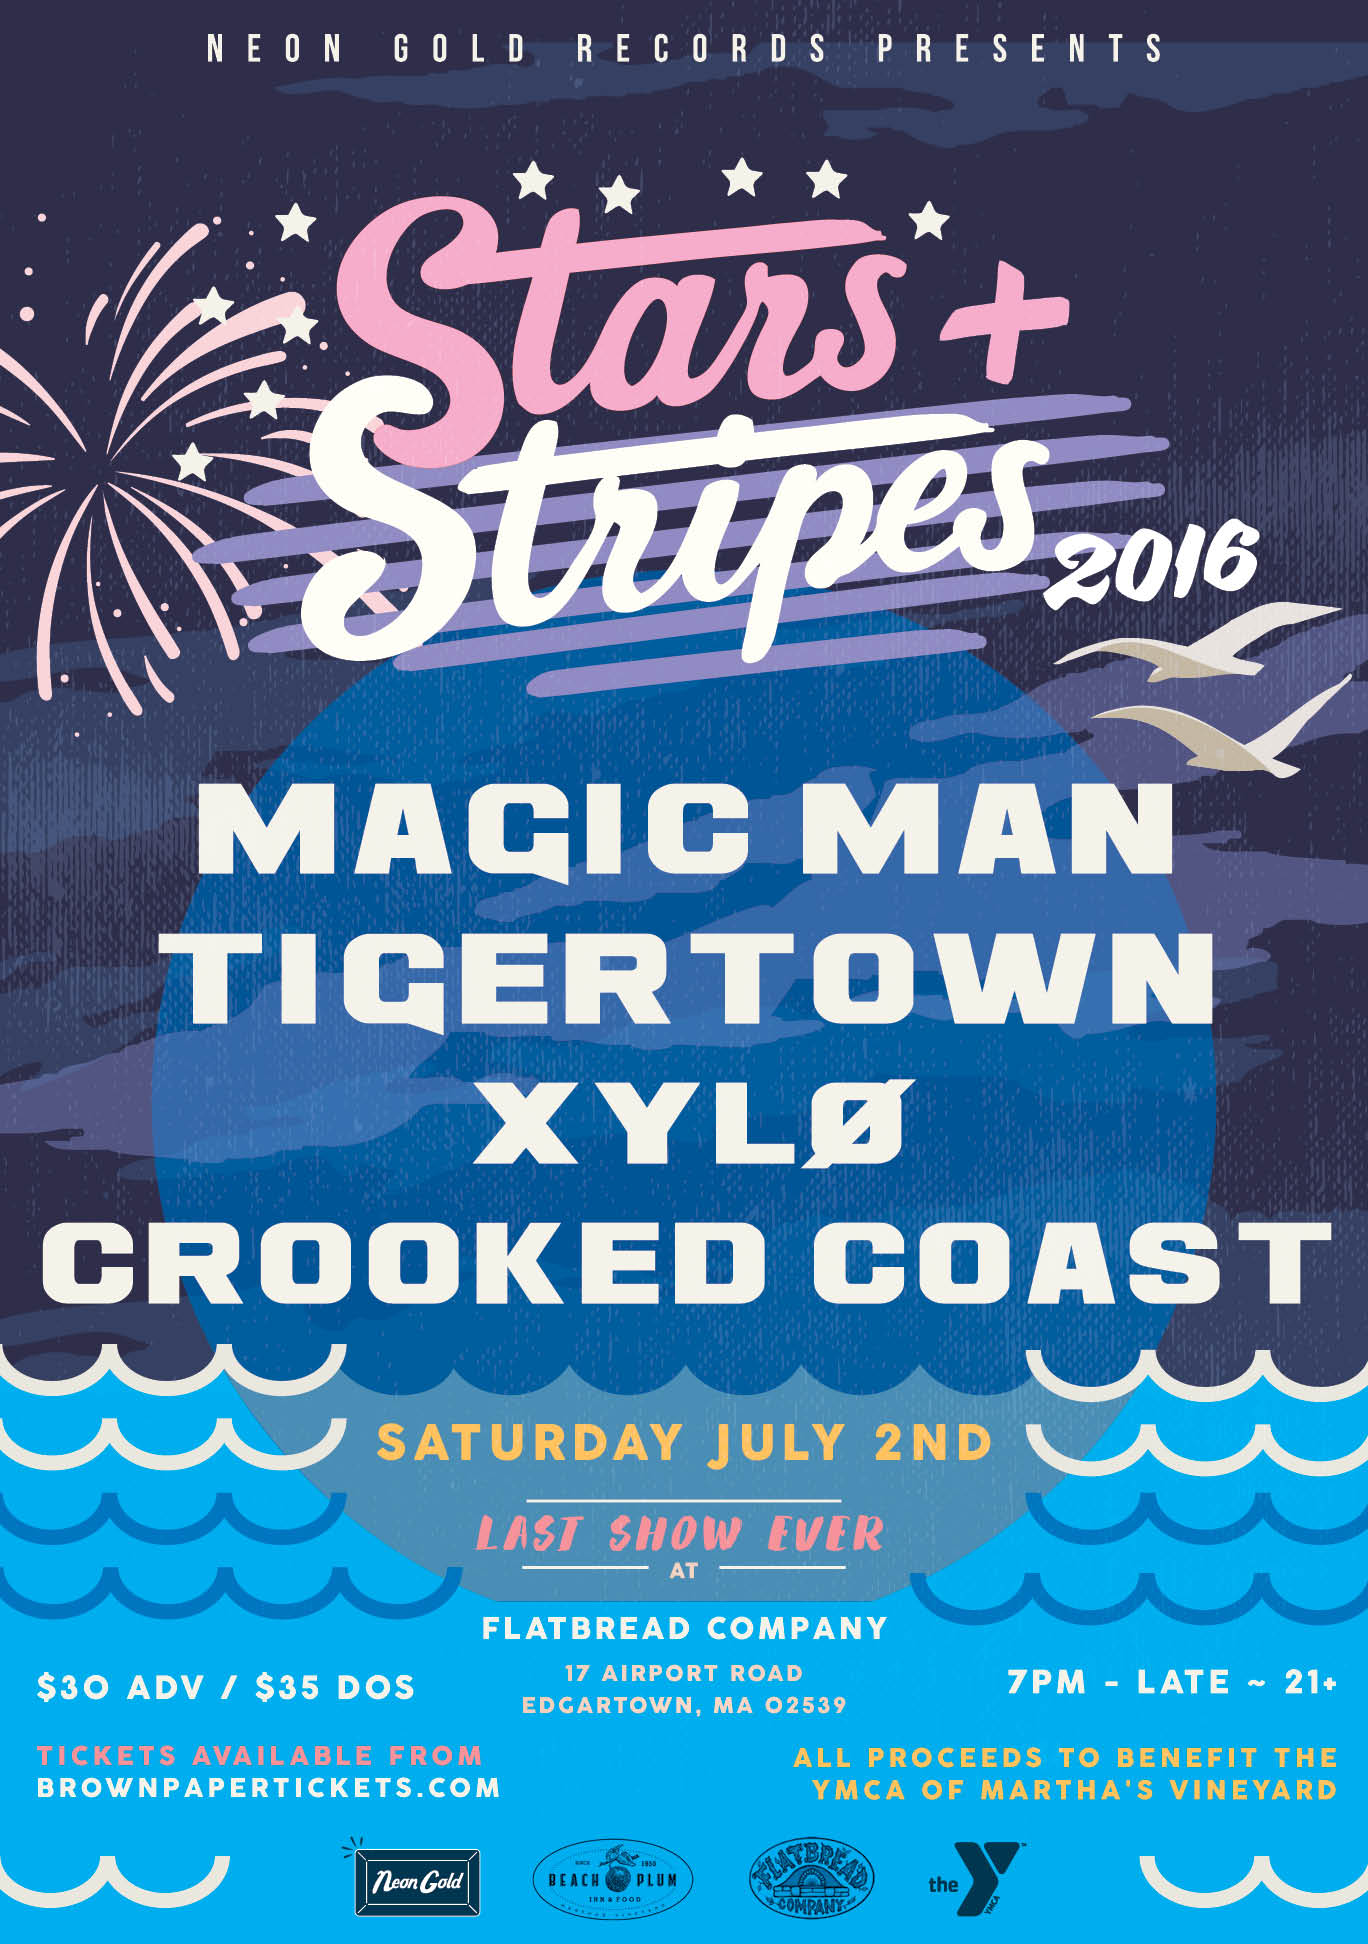 Stars + Stripes 2016